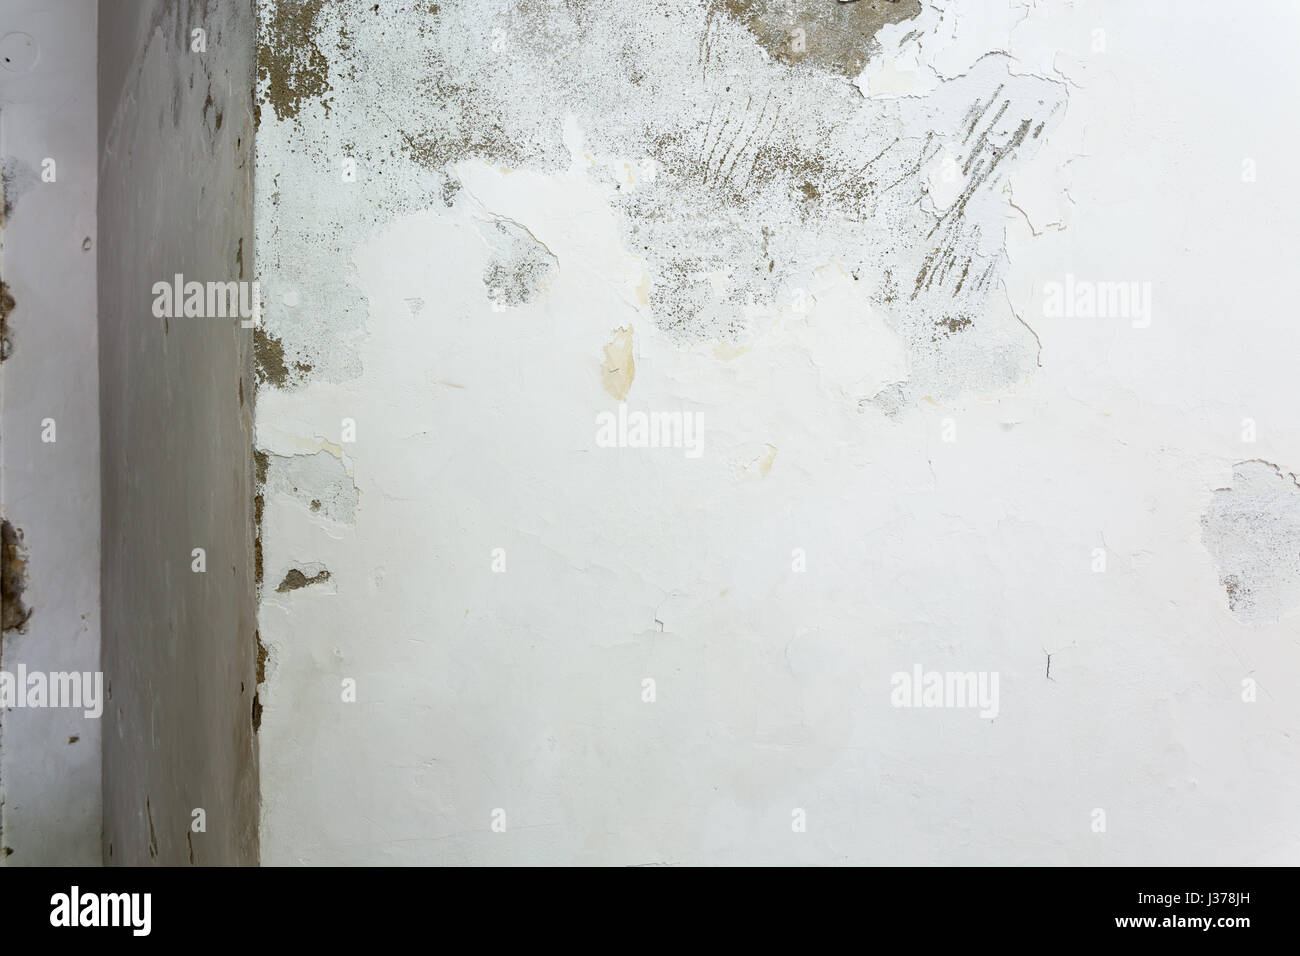 rising damp stock photos rising damp stock images alamy. Black Bedroom Furniture Sets. Home Design Ideas